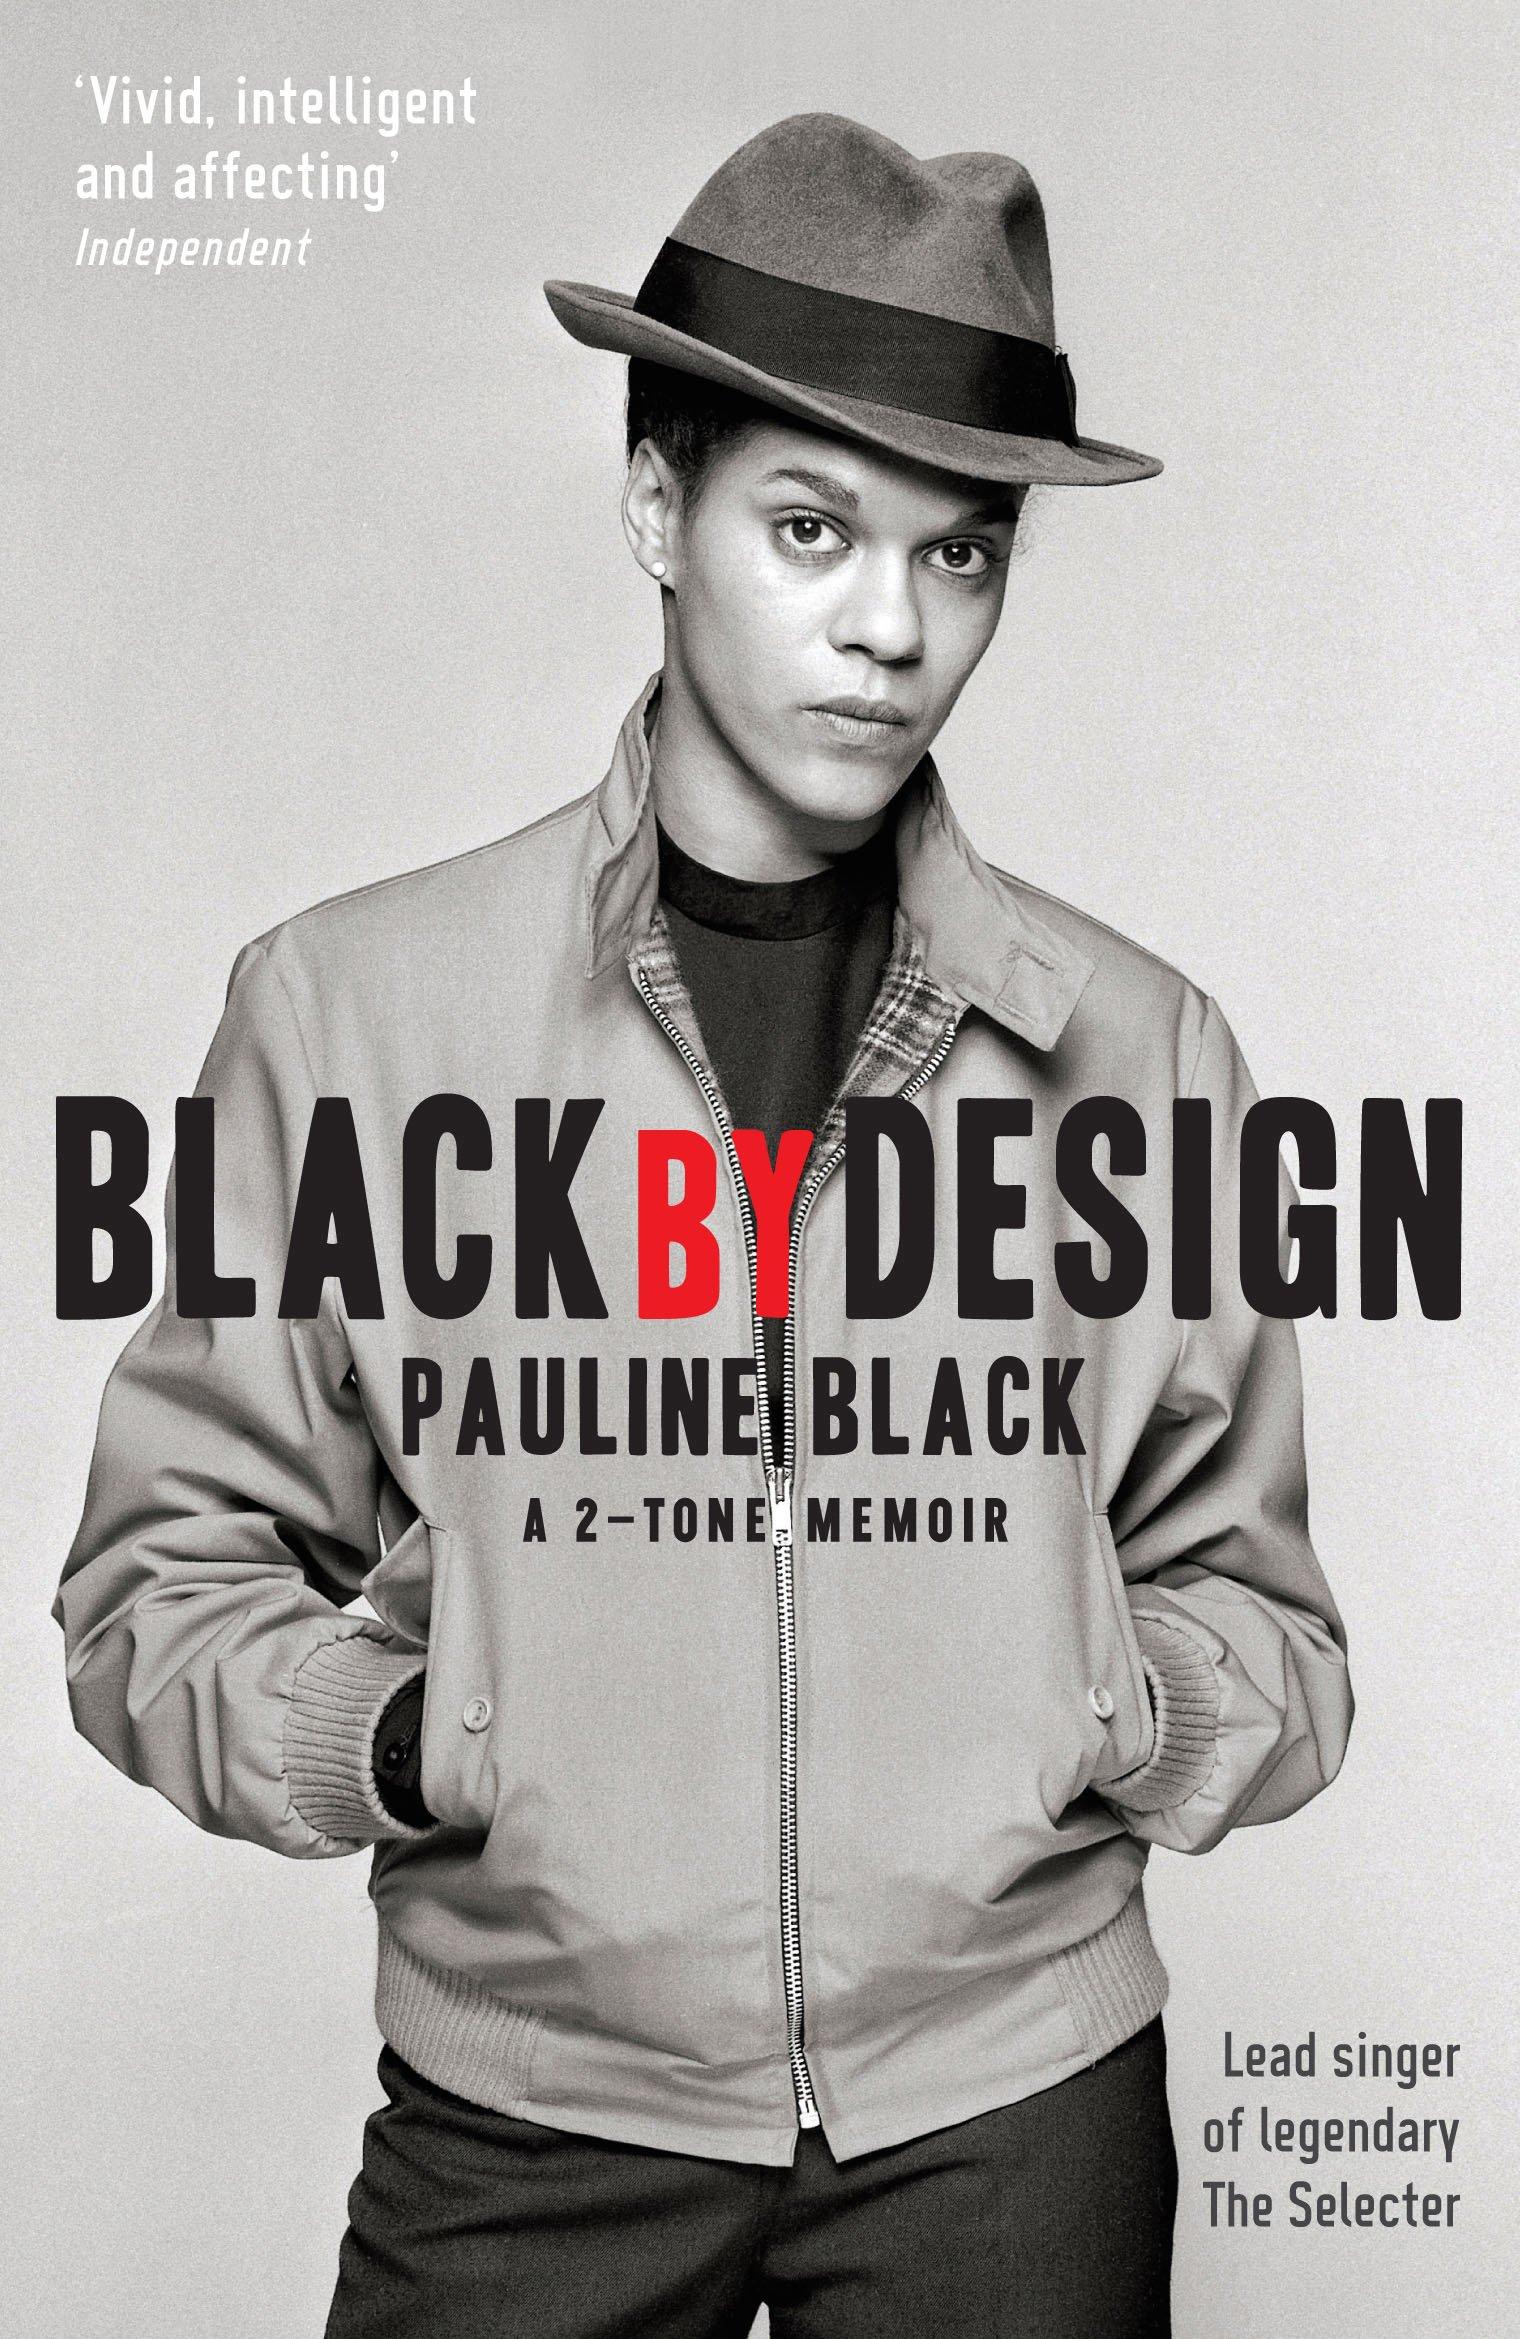 Pauline Black Pauline Black new images